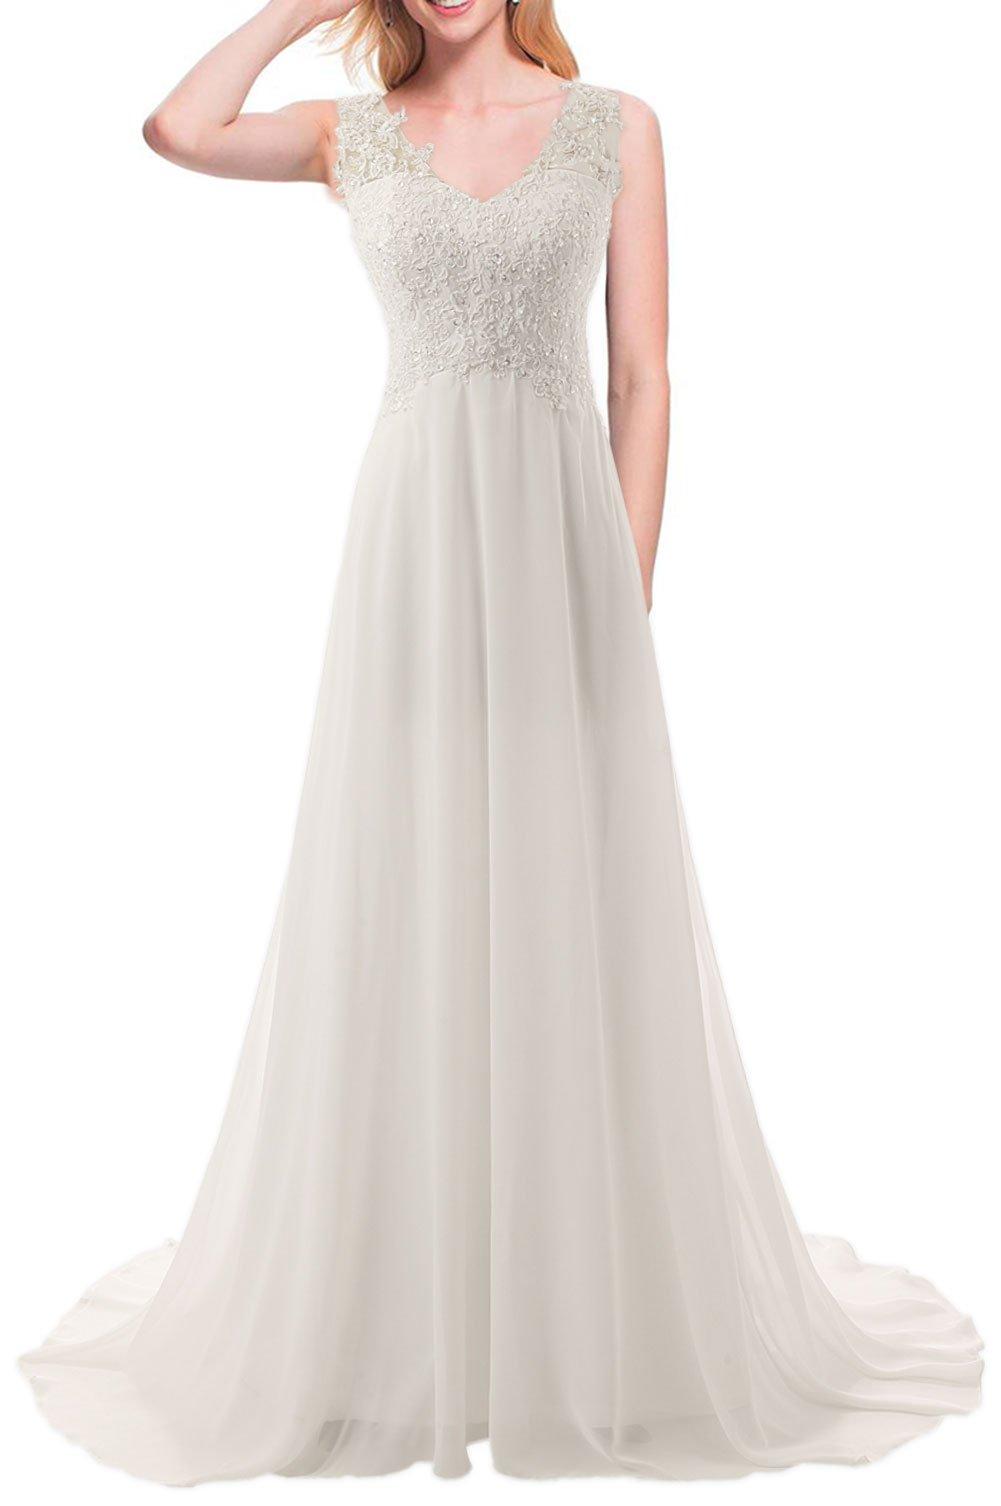 8b1996a9642 JAEDEN Wedding Dress Beach Bridal Dresses Lace Wedding Gown A Line Bride  Dress Ivory US20W